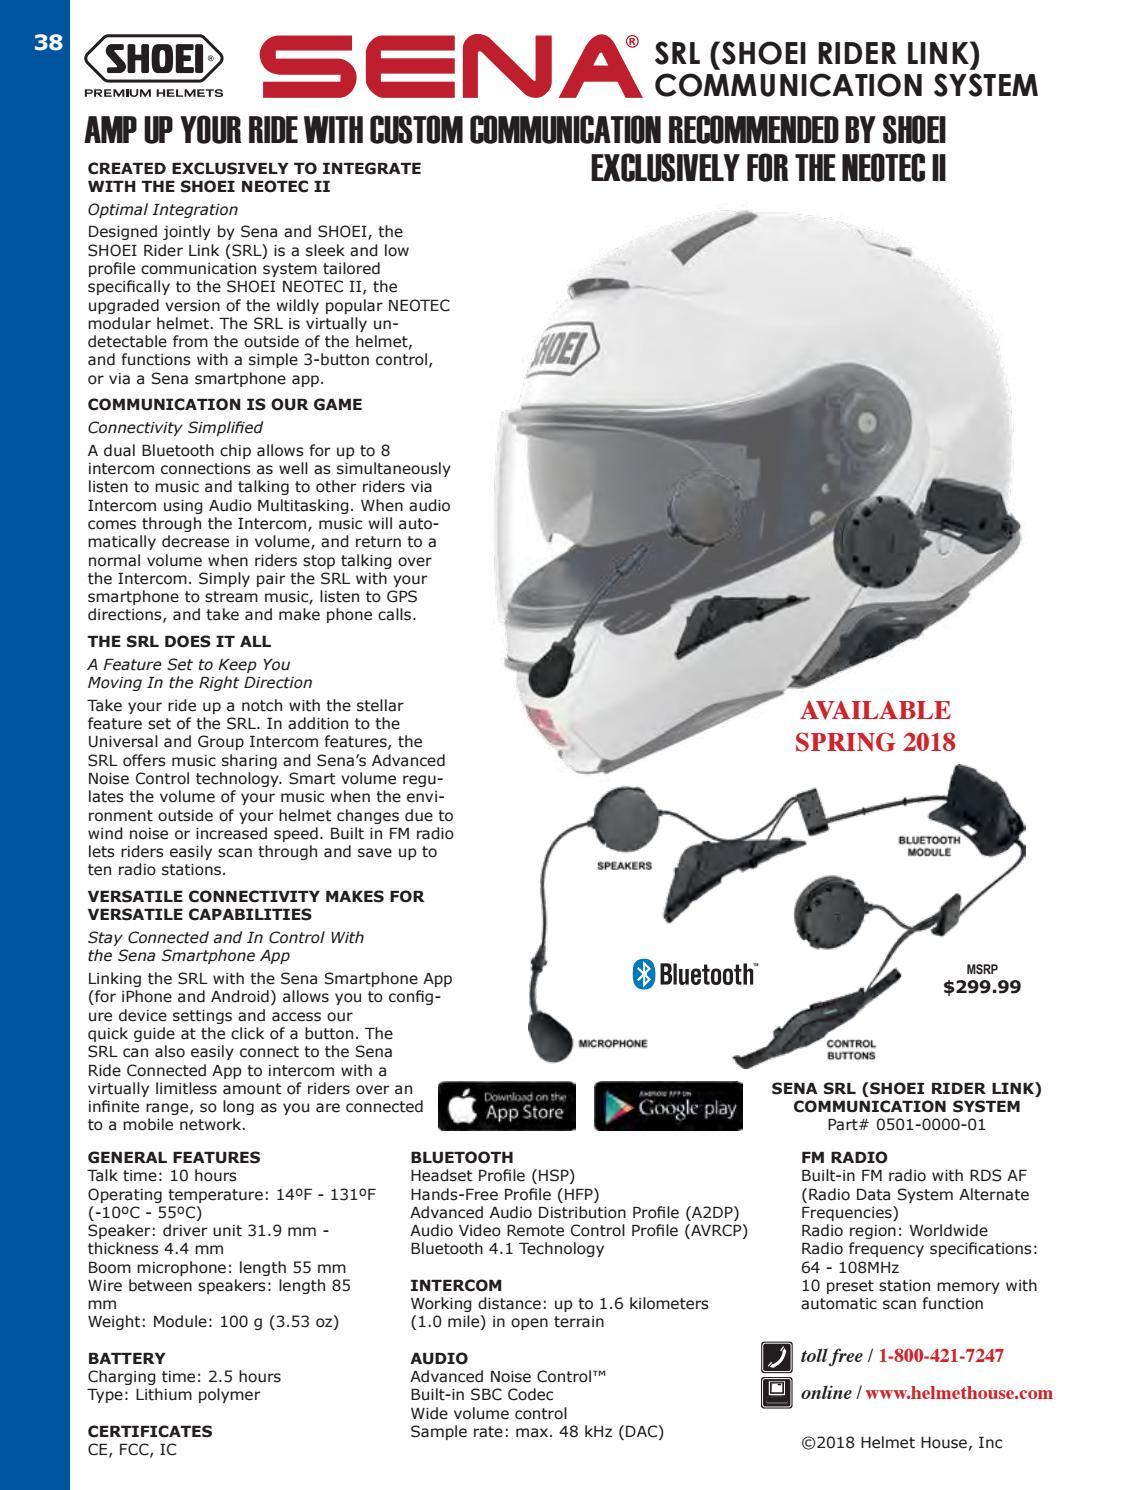 2018 Helmet House Full Catalog by Helmet House Inc  - issuu